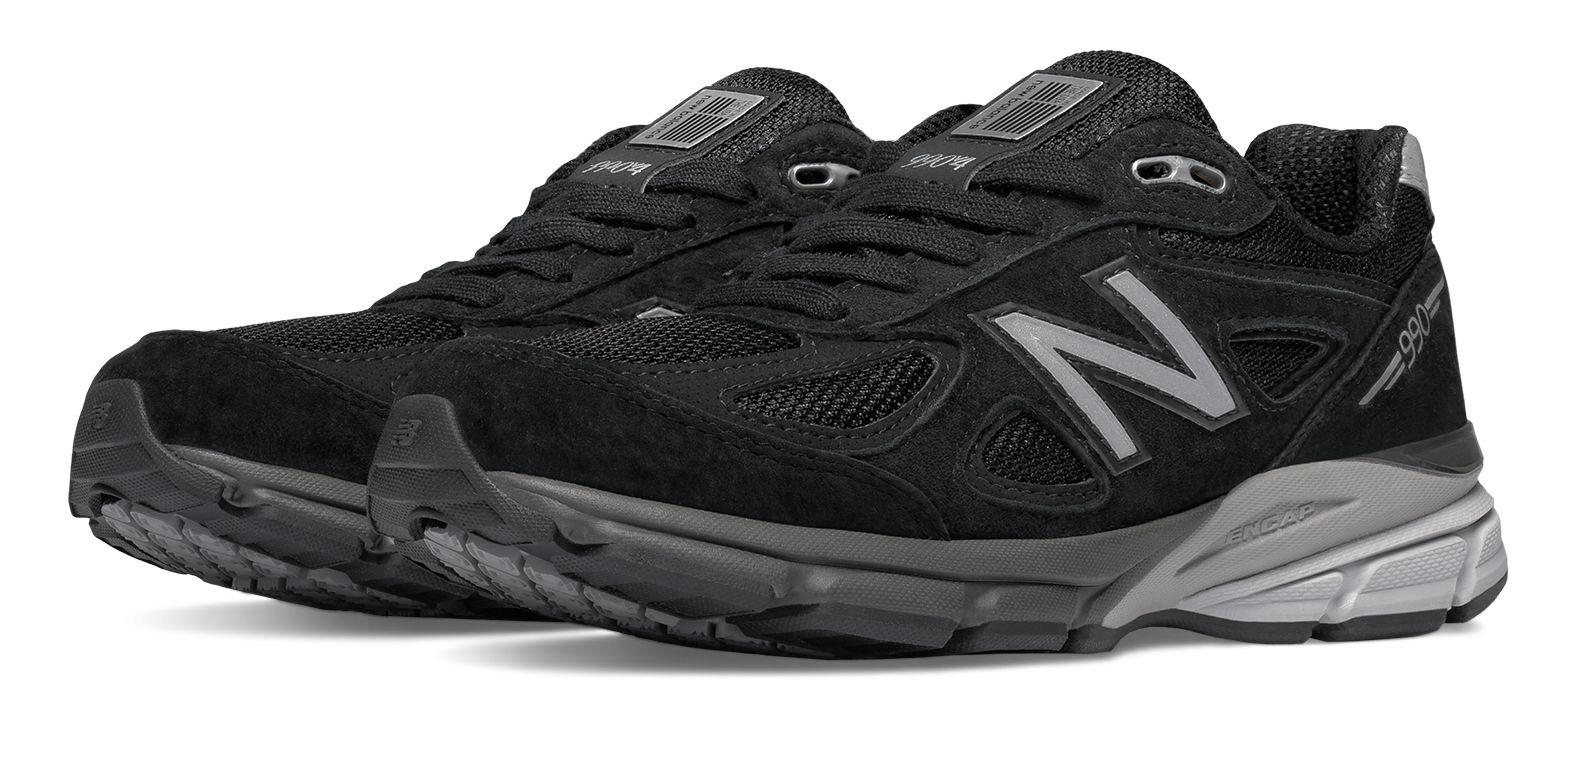 New Balance 990v4 Women's Running Shoes